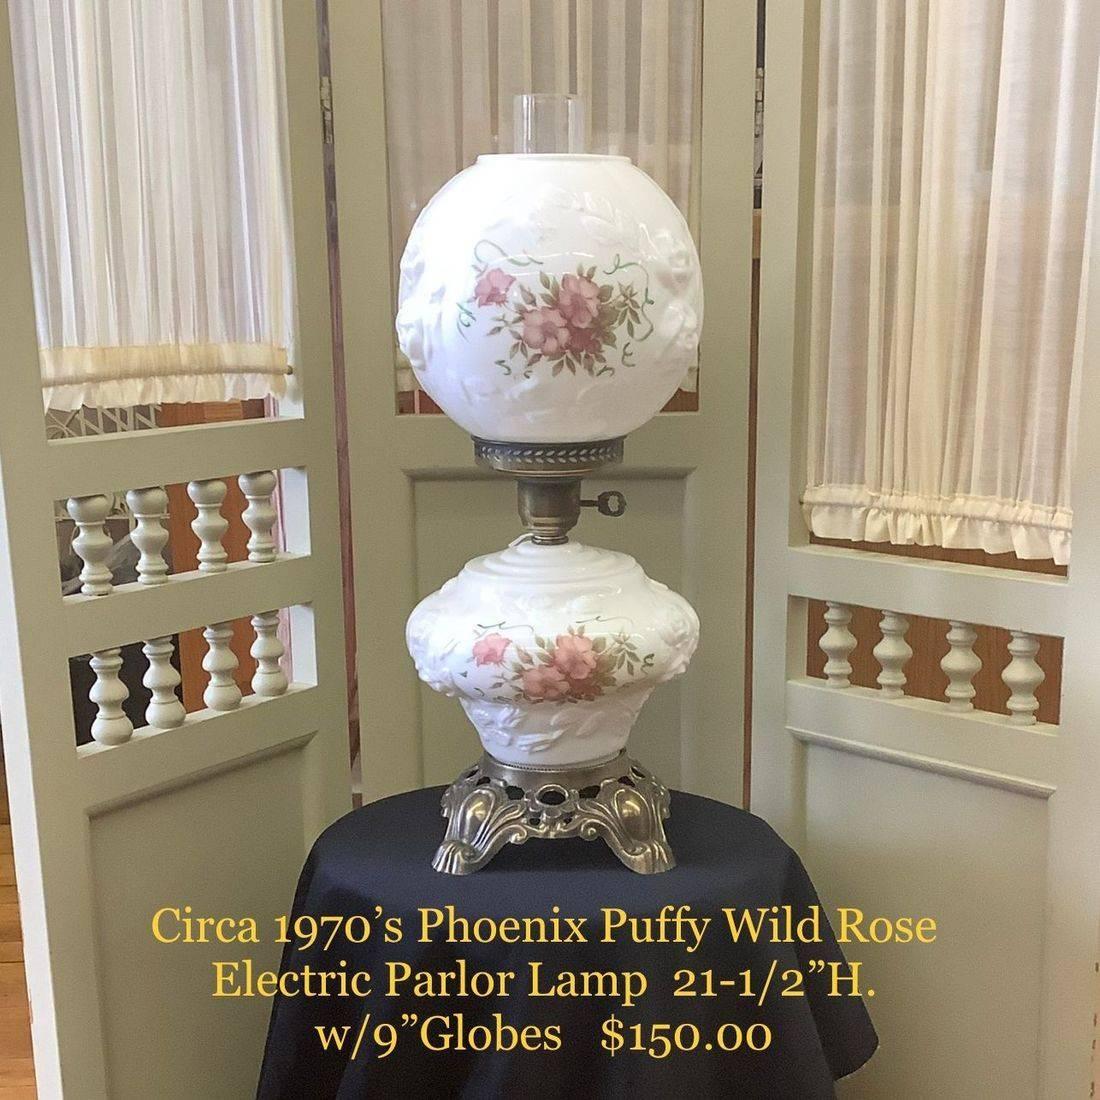 Circa 1970's Phoenix Puffy Wild Rose Electric Parlor Lamp   $150.00